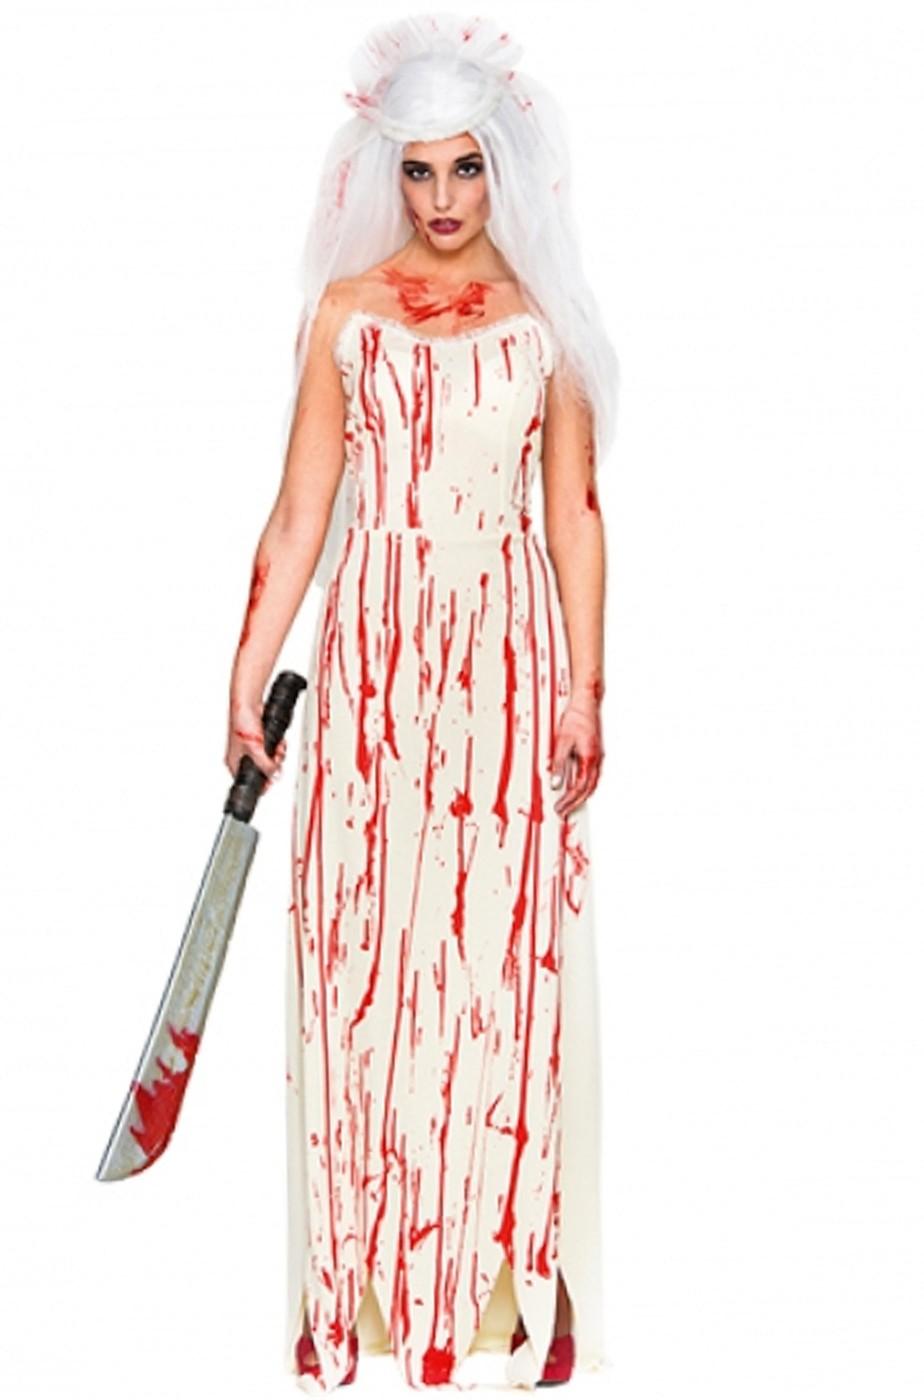 Costume adulta sposa cadavere